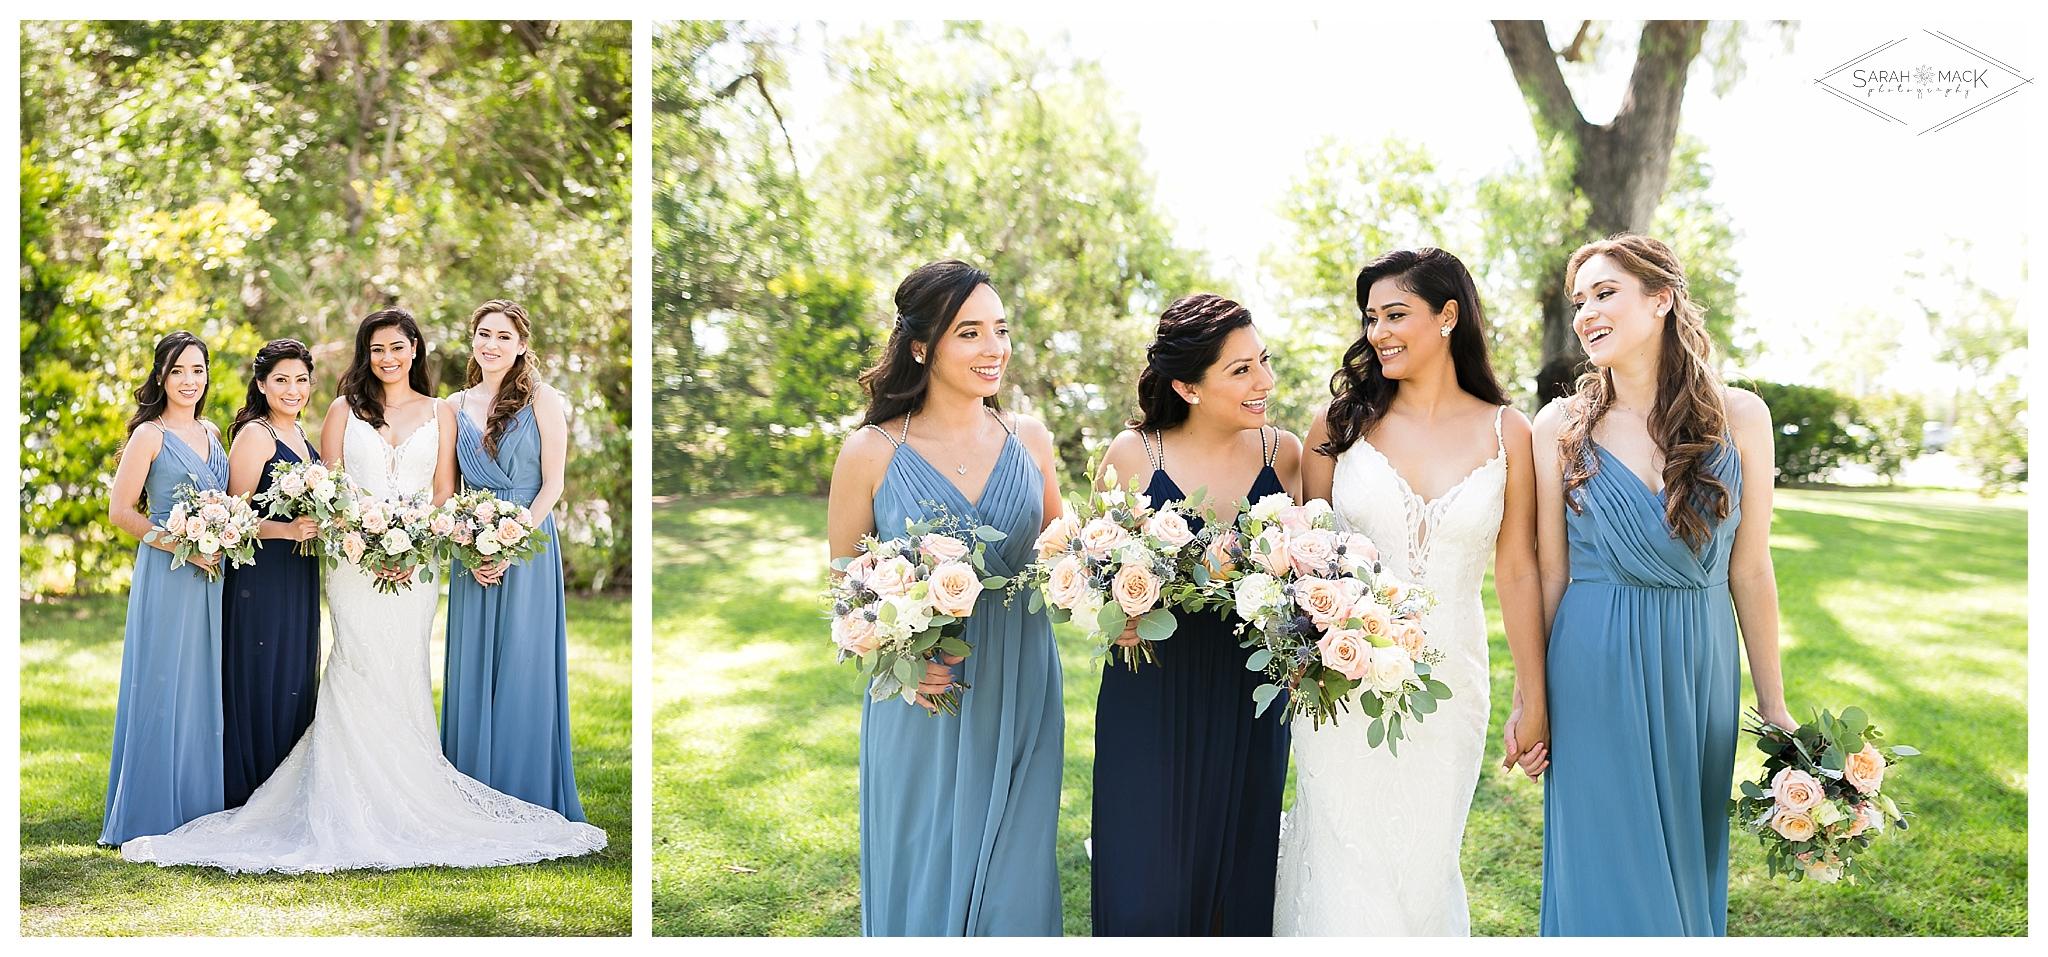 IA-Alta-Vista-Country-Club-Yorba-Linda-Wedding-Photography 230.jpg